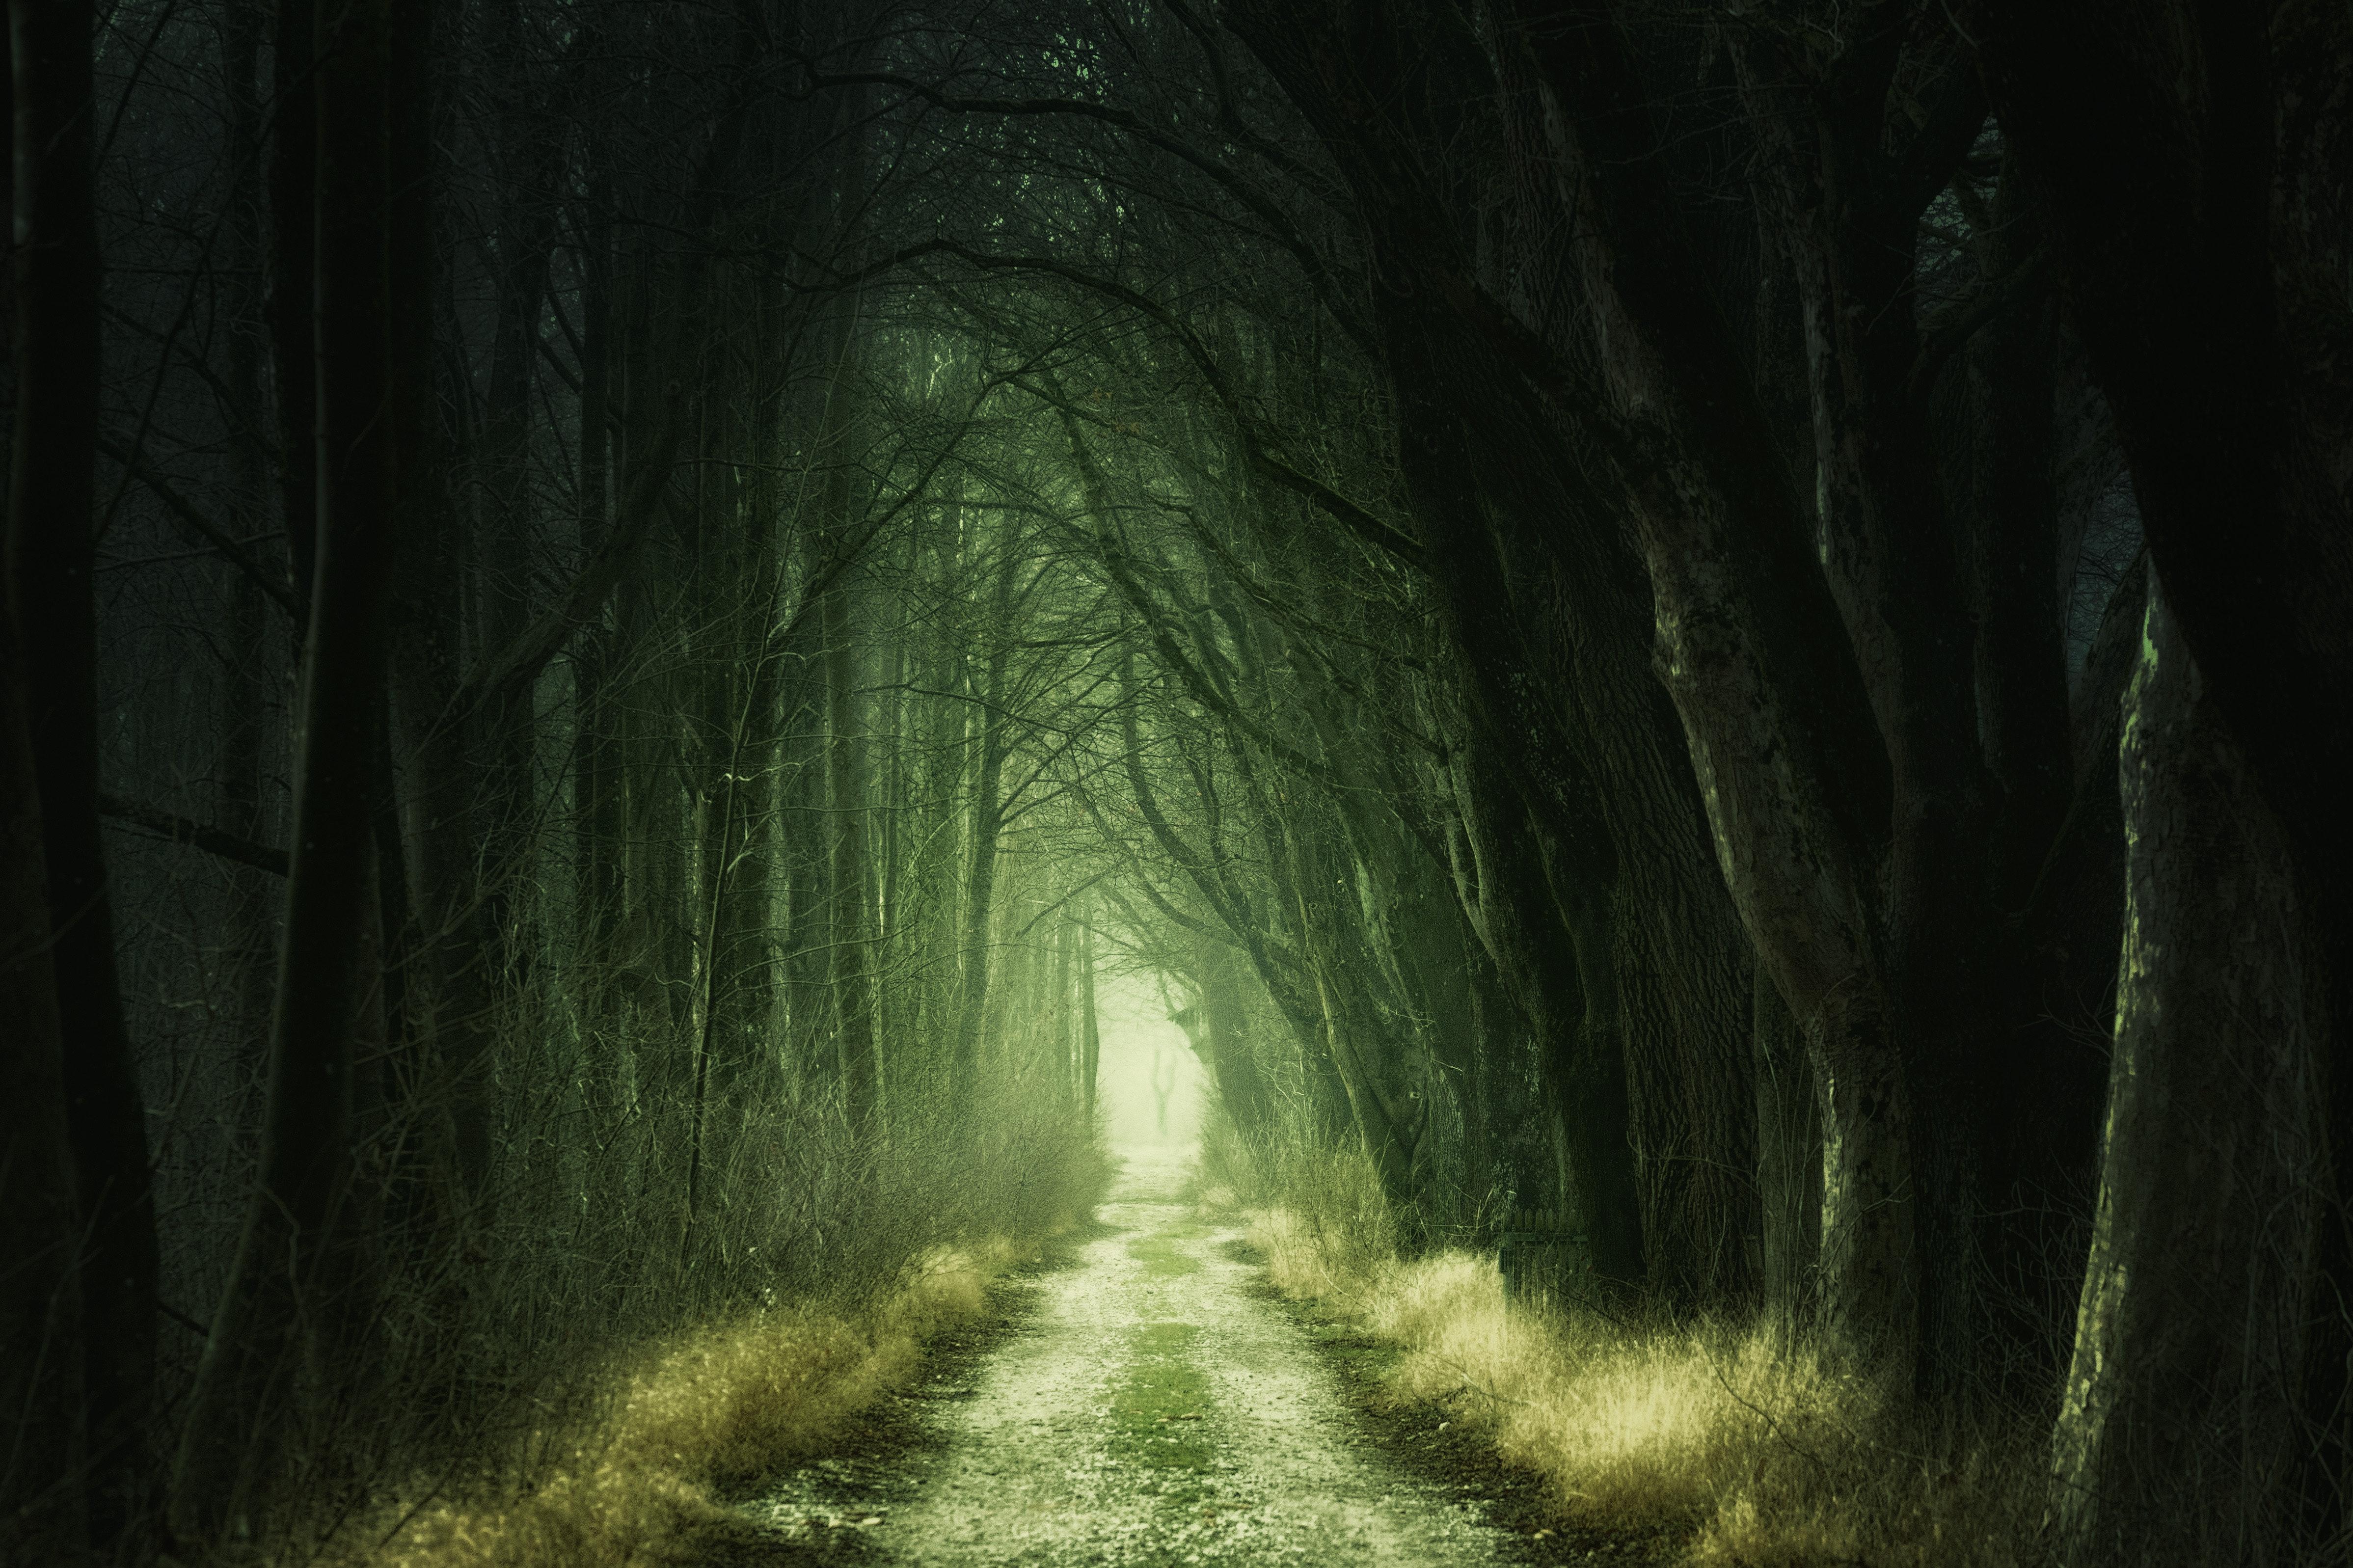 dark-daylight-eerie-1165982